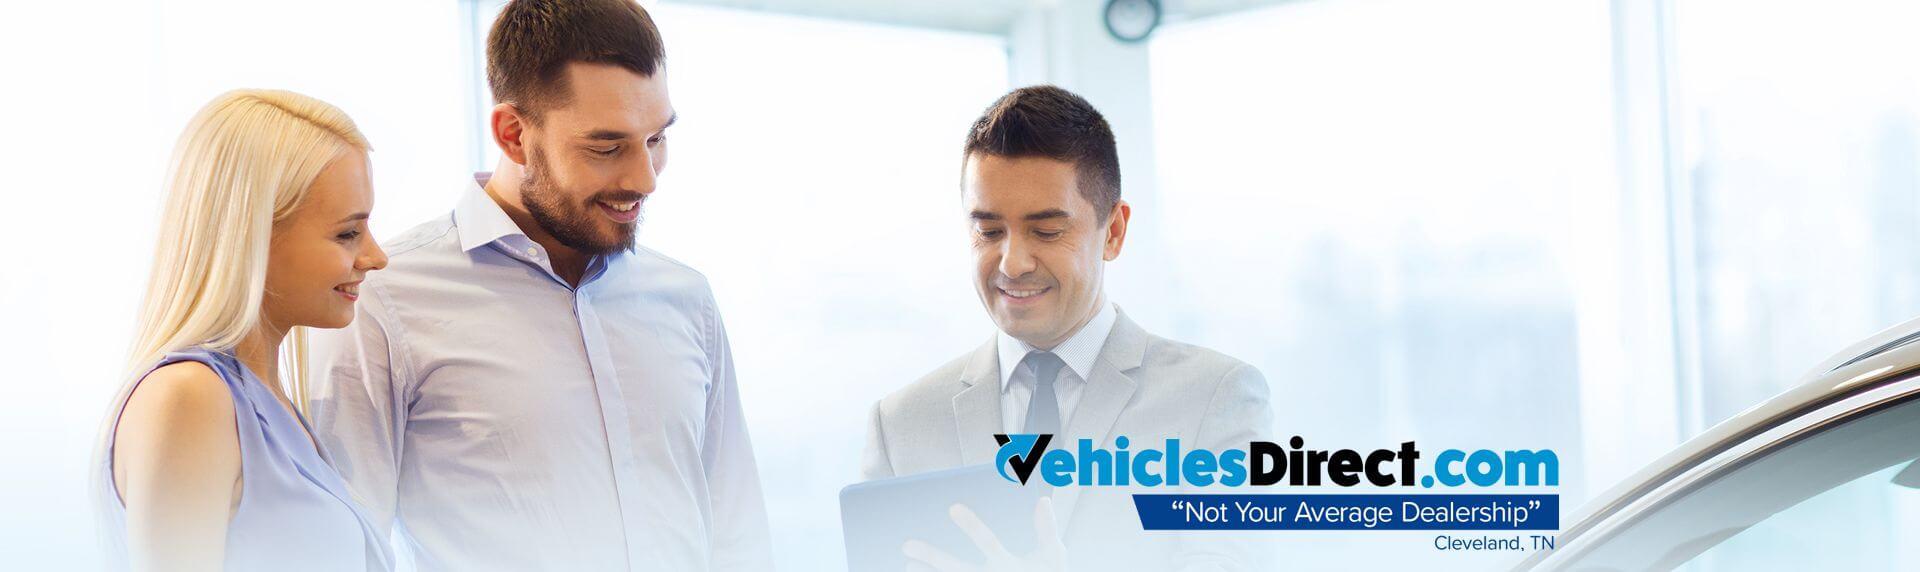 VehicleDirect.com